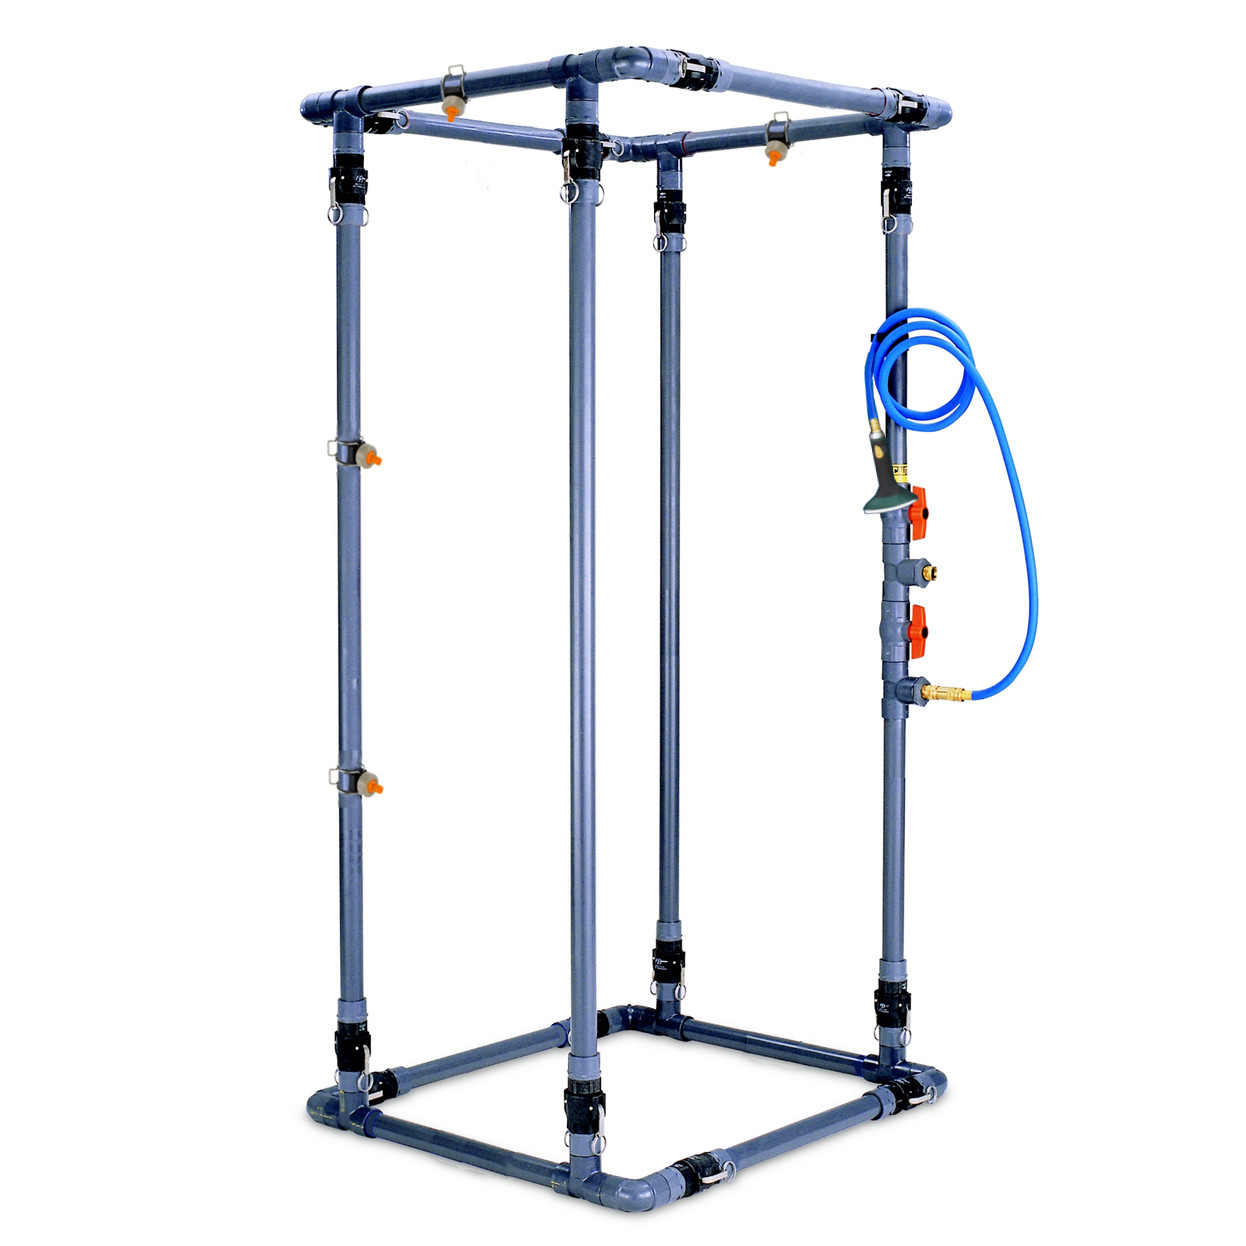 DQE Standard Decontamination Shower with no enclosure